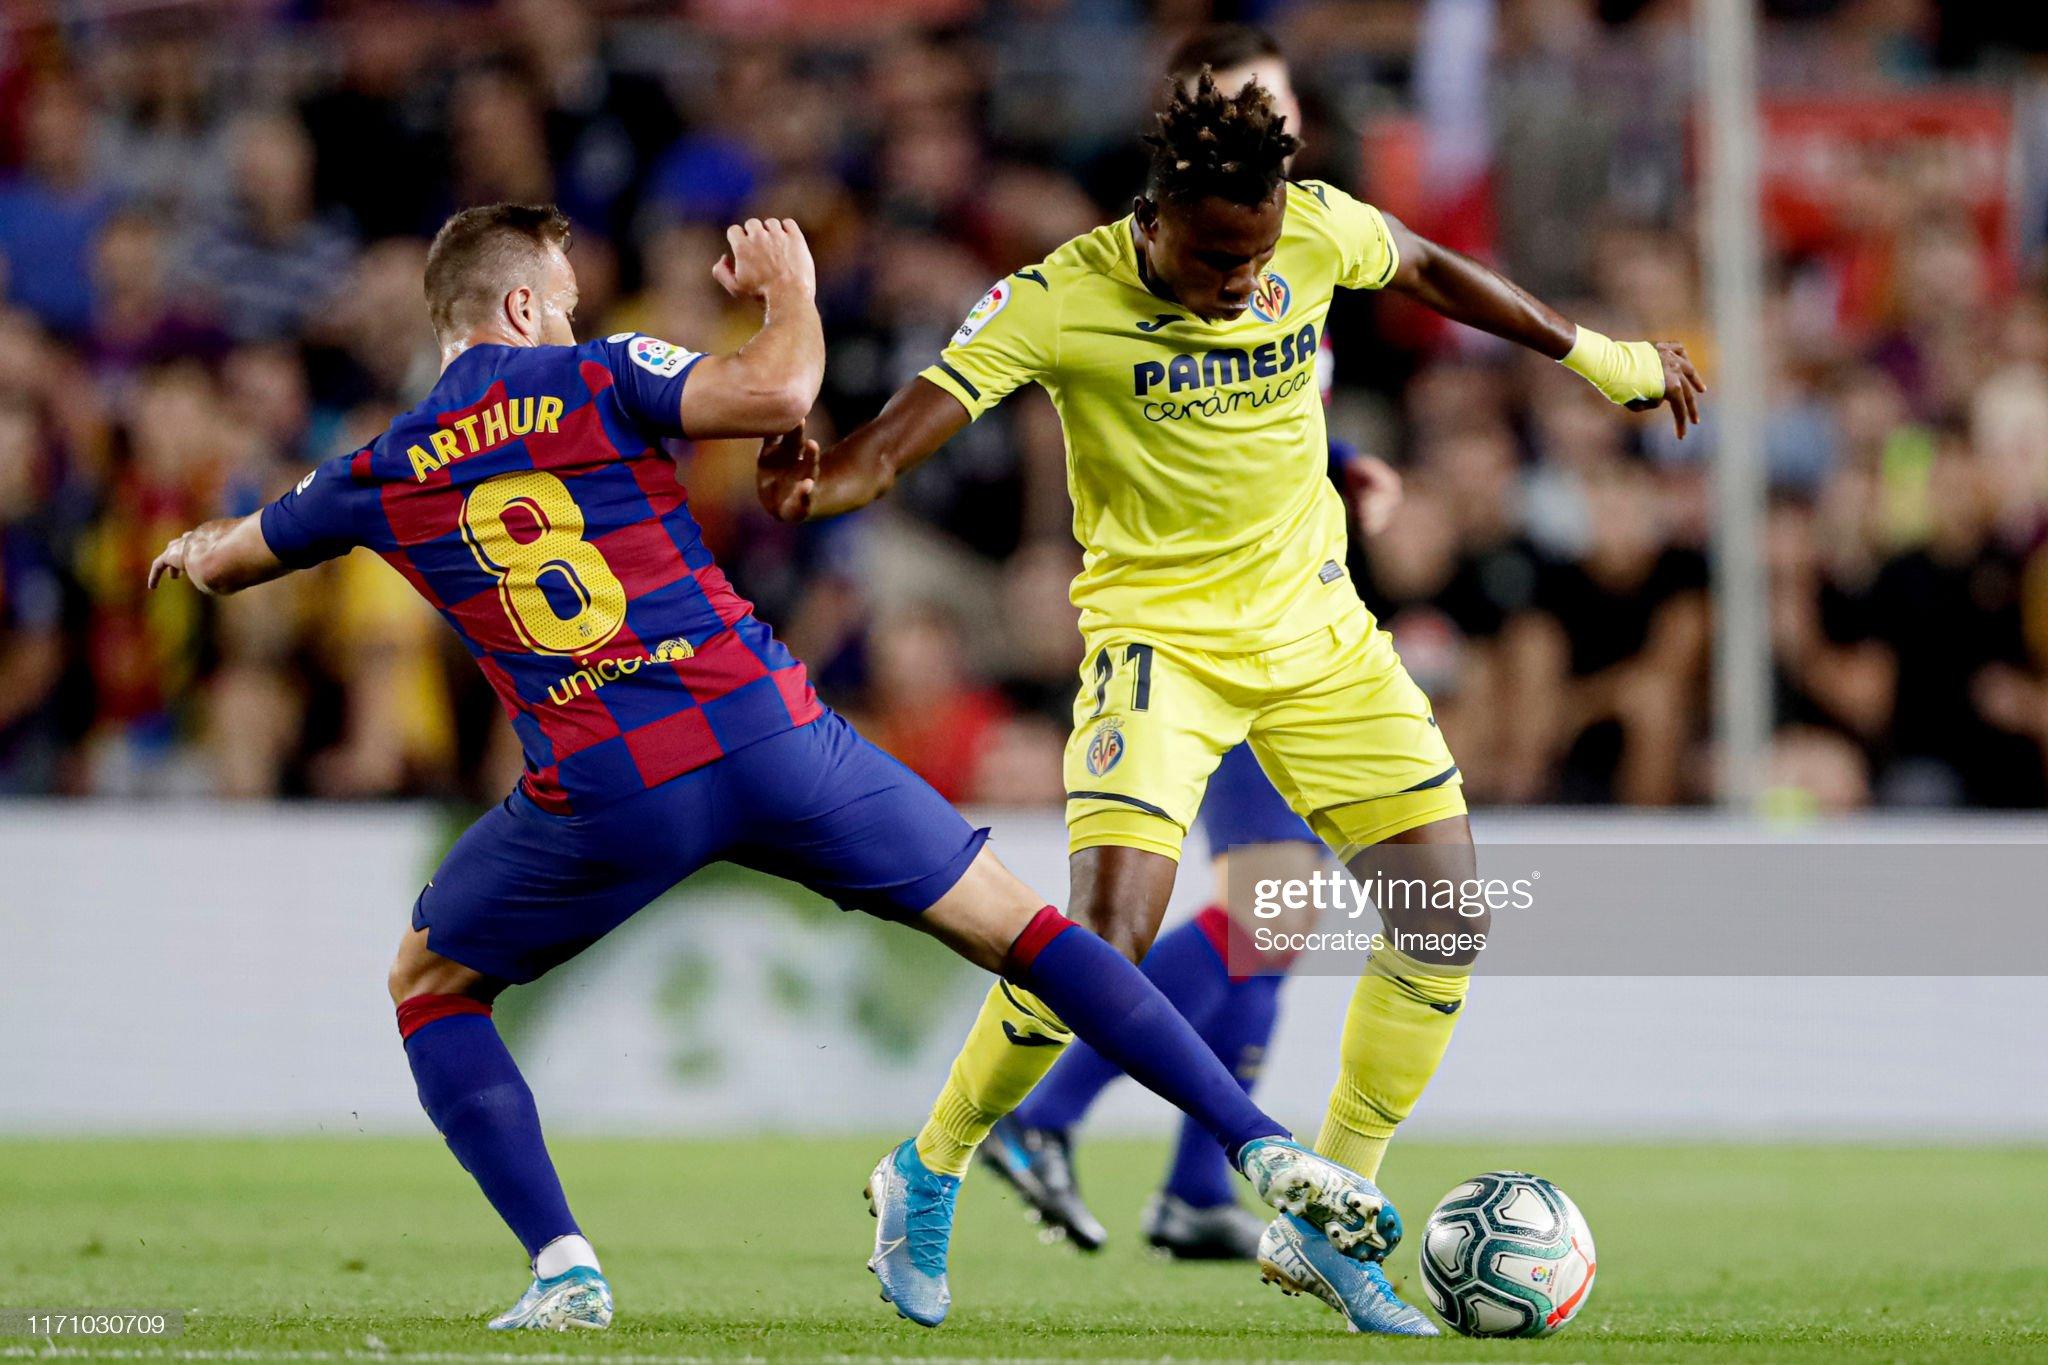 صور مباراة : برشلونة - فياريال 2-1 ( 24-09-2019 )  Arthur-of-fc-barcelona-samuel-chukwueze-of-villarreal-during-the-la-picture-id1171030709?s=2048x2048